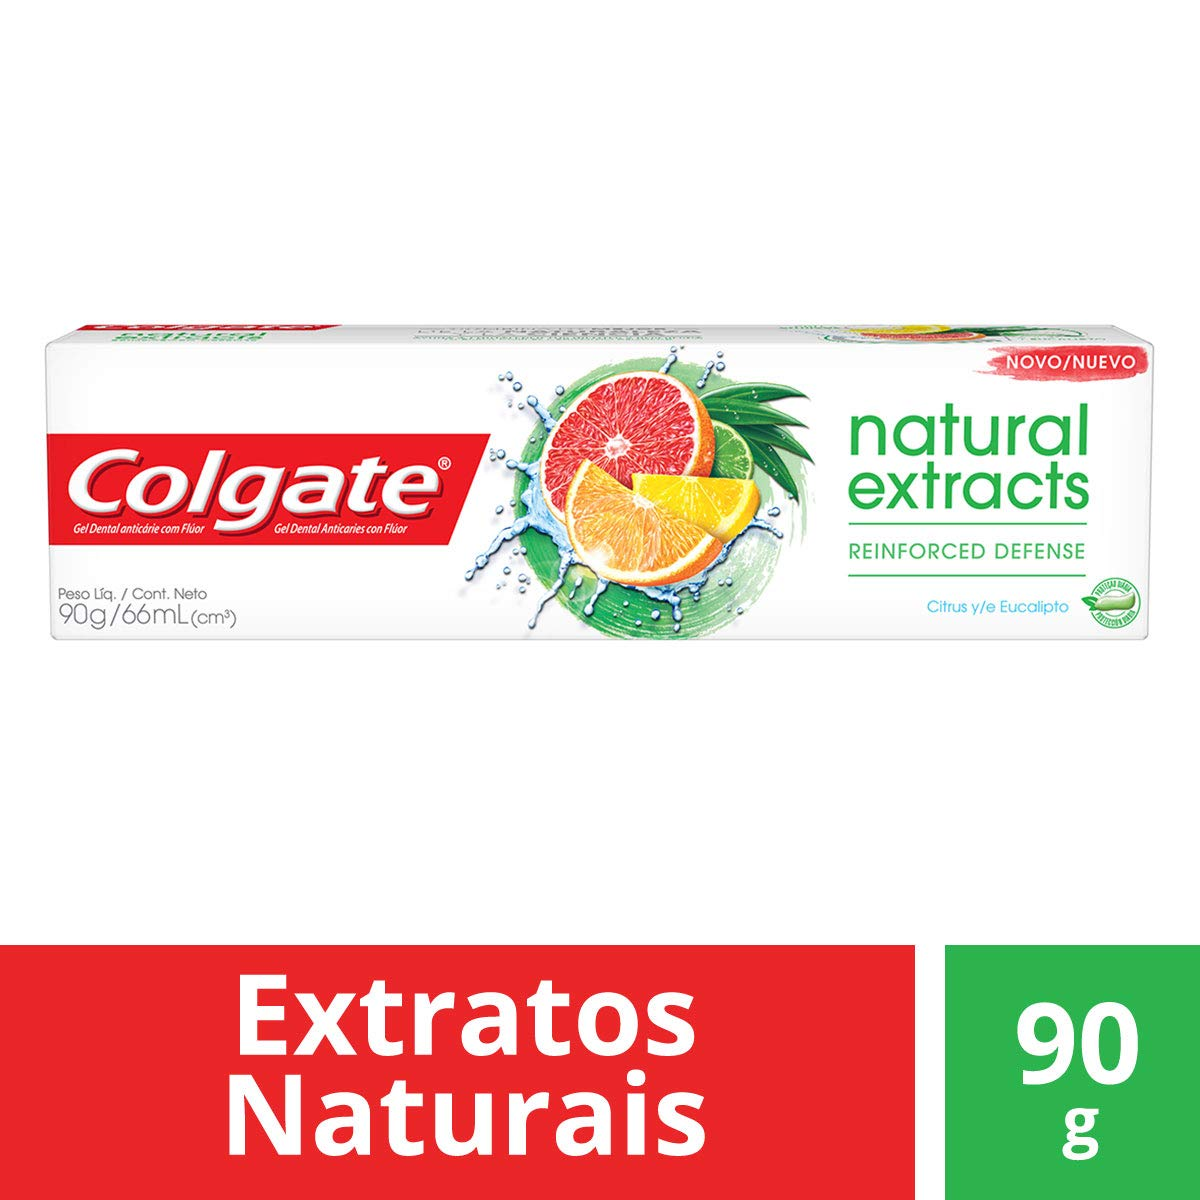 Creme Dental Colgate Natural Extracts Reinforced Defense 90g